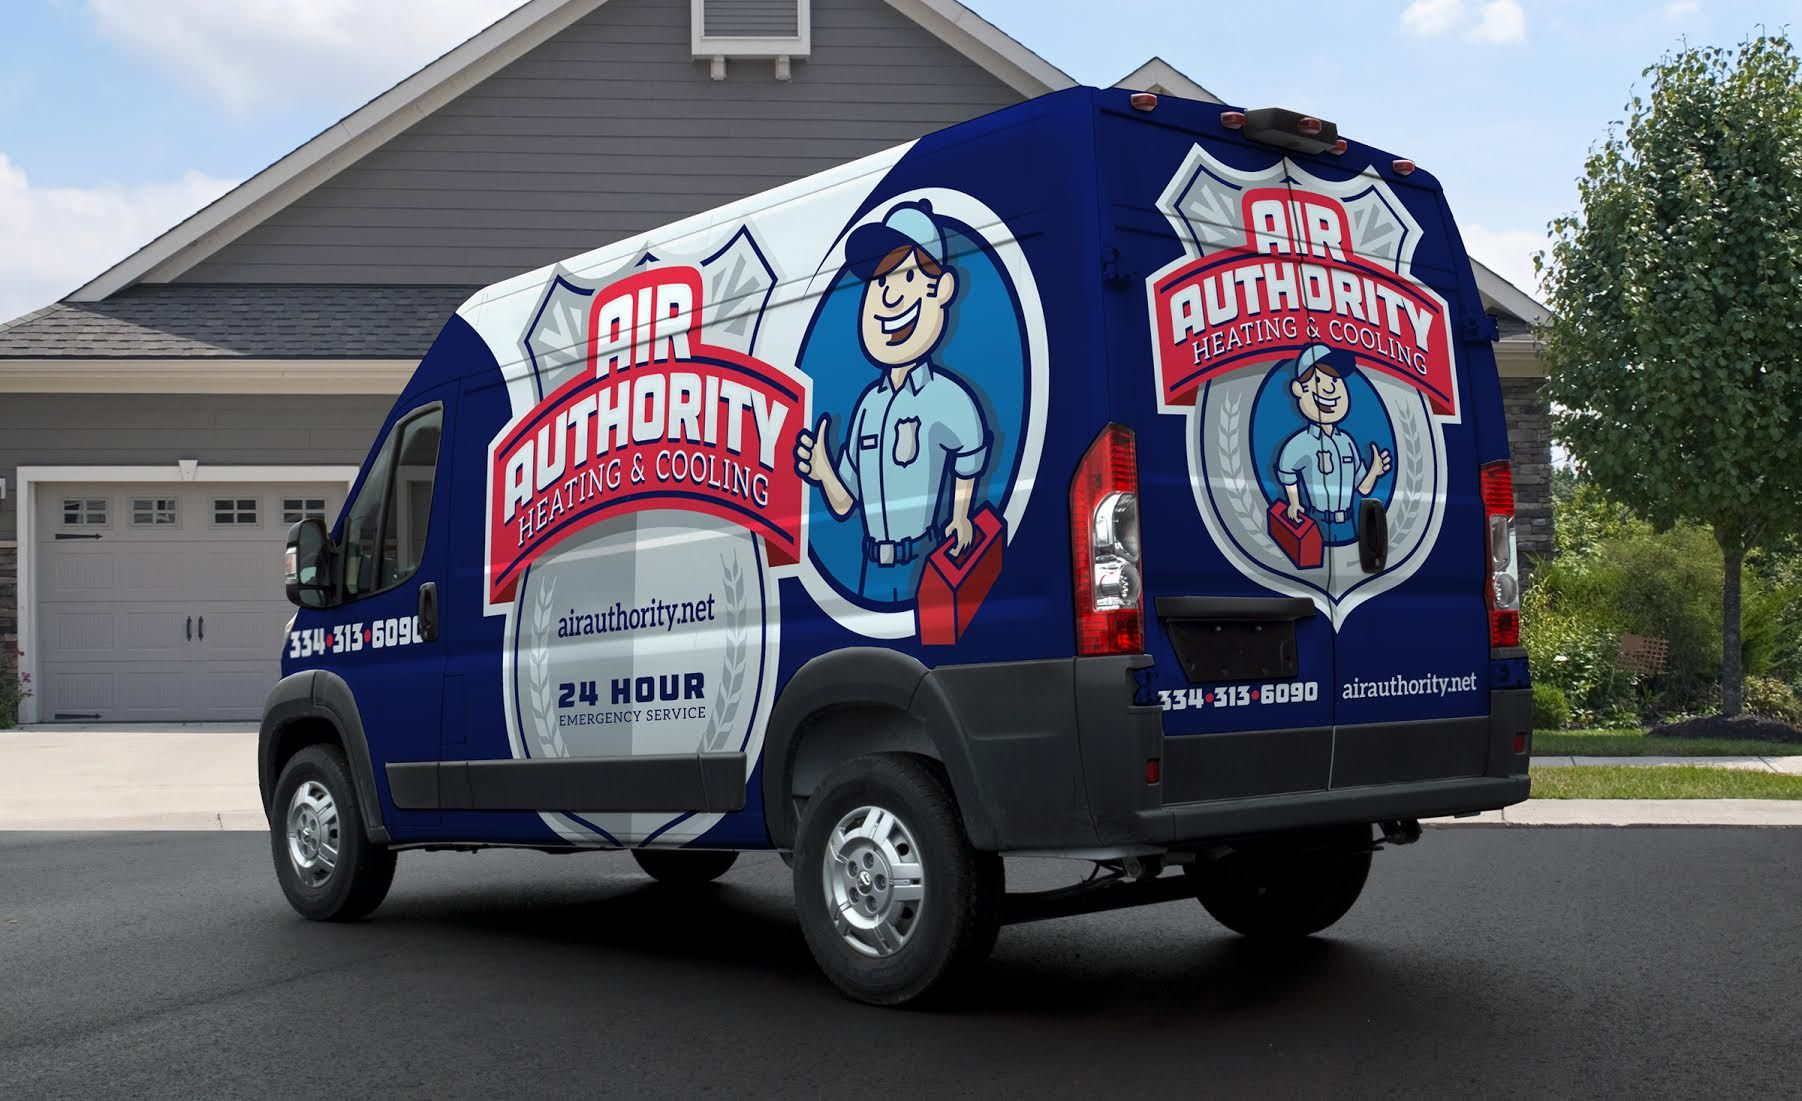 Our Best Truck Wraps Best Hvac Van Wraps Fleet Branding Nj Truck Wraps Cool Trucks Van Wrap Car Wrap